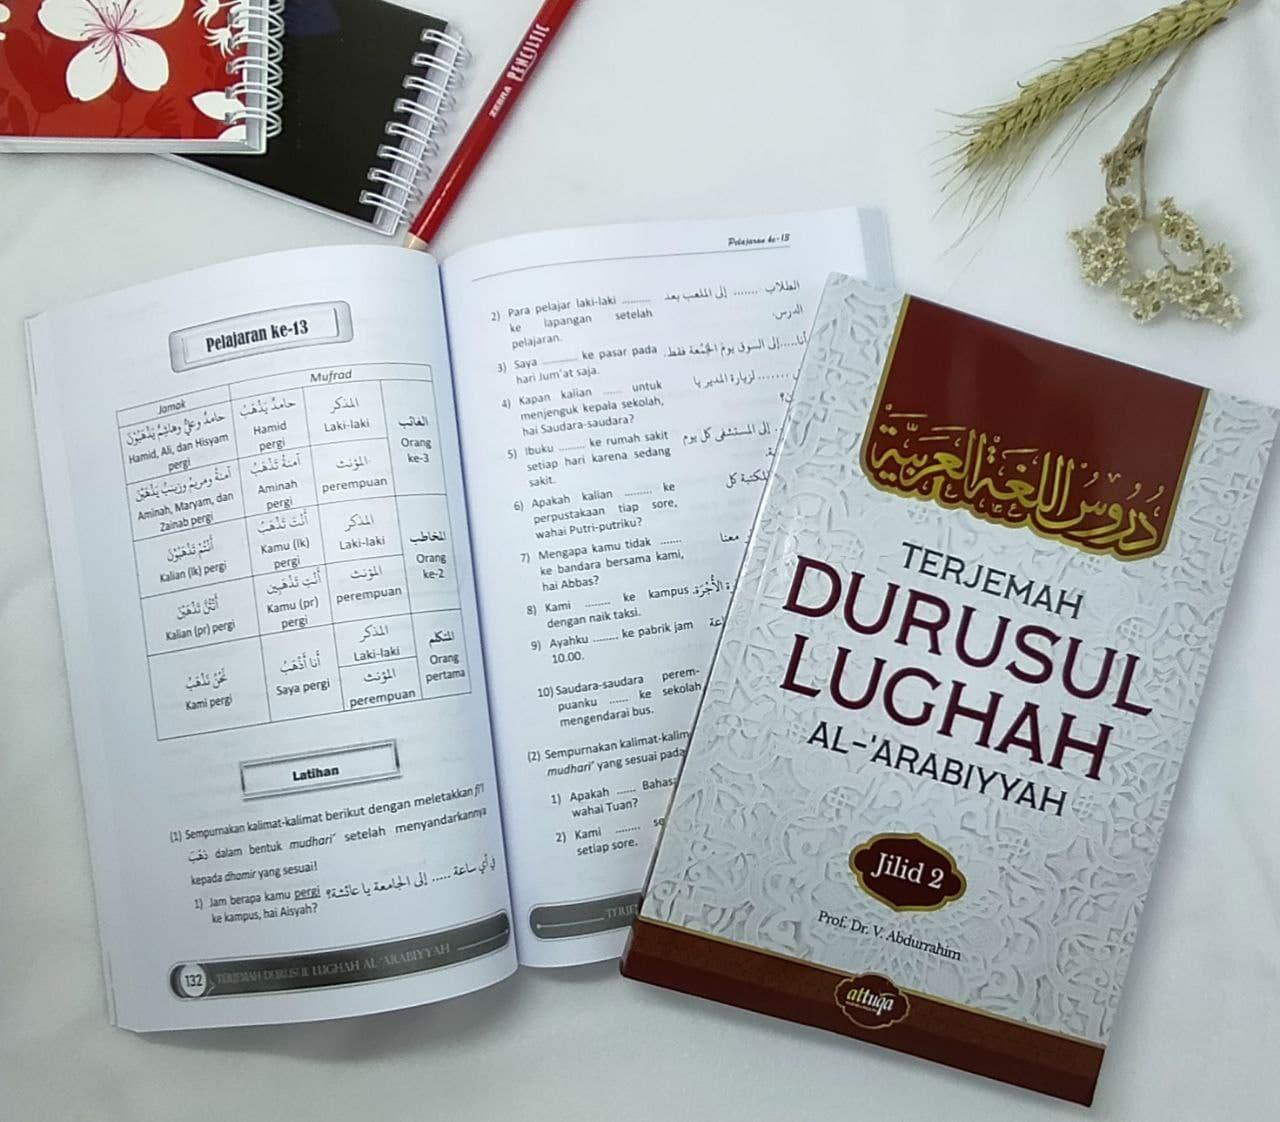 Buku Terjemah Durusul Lughah Jilid 2 Attuqa (1)